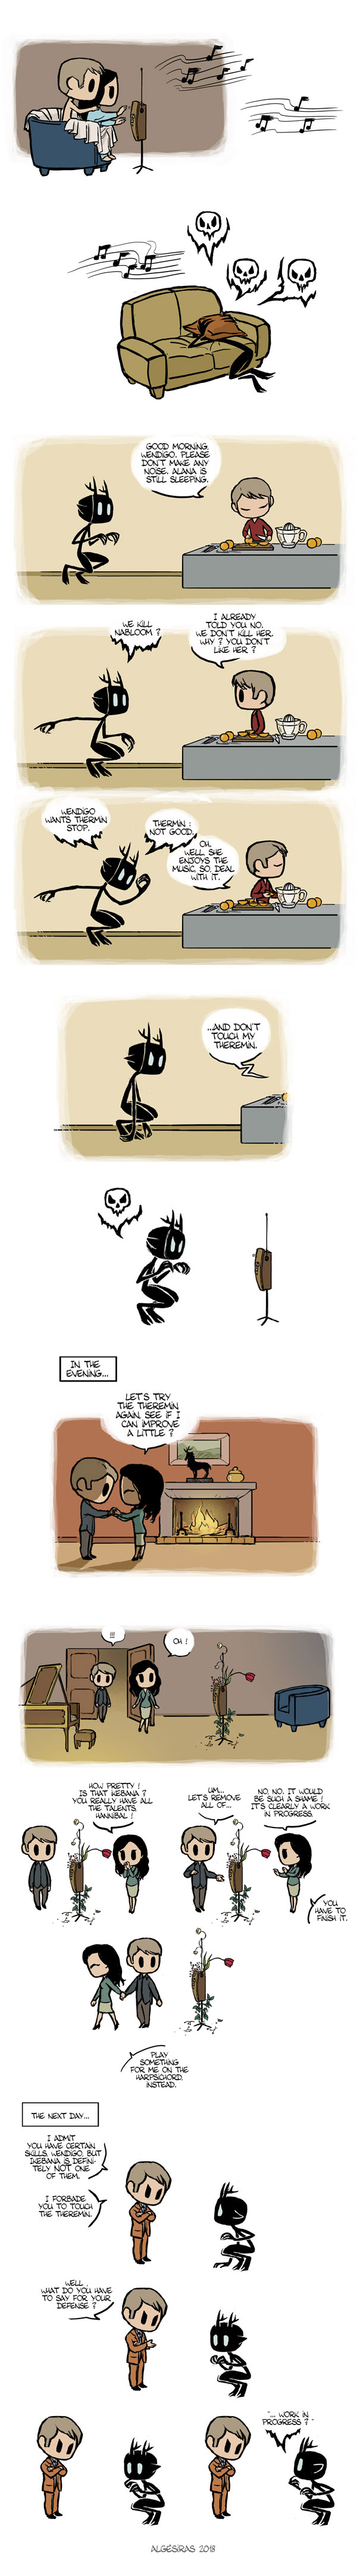 Pet Wendigo strip 30 - Ikebana by Algesiras